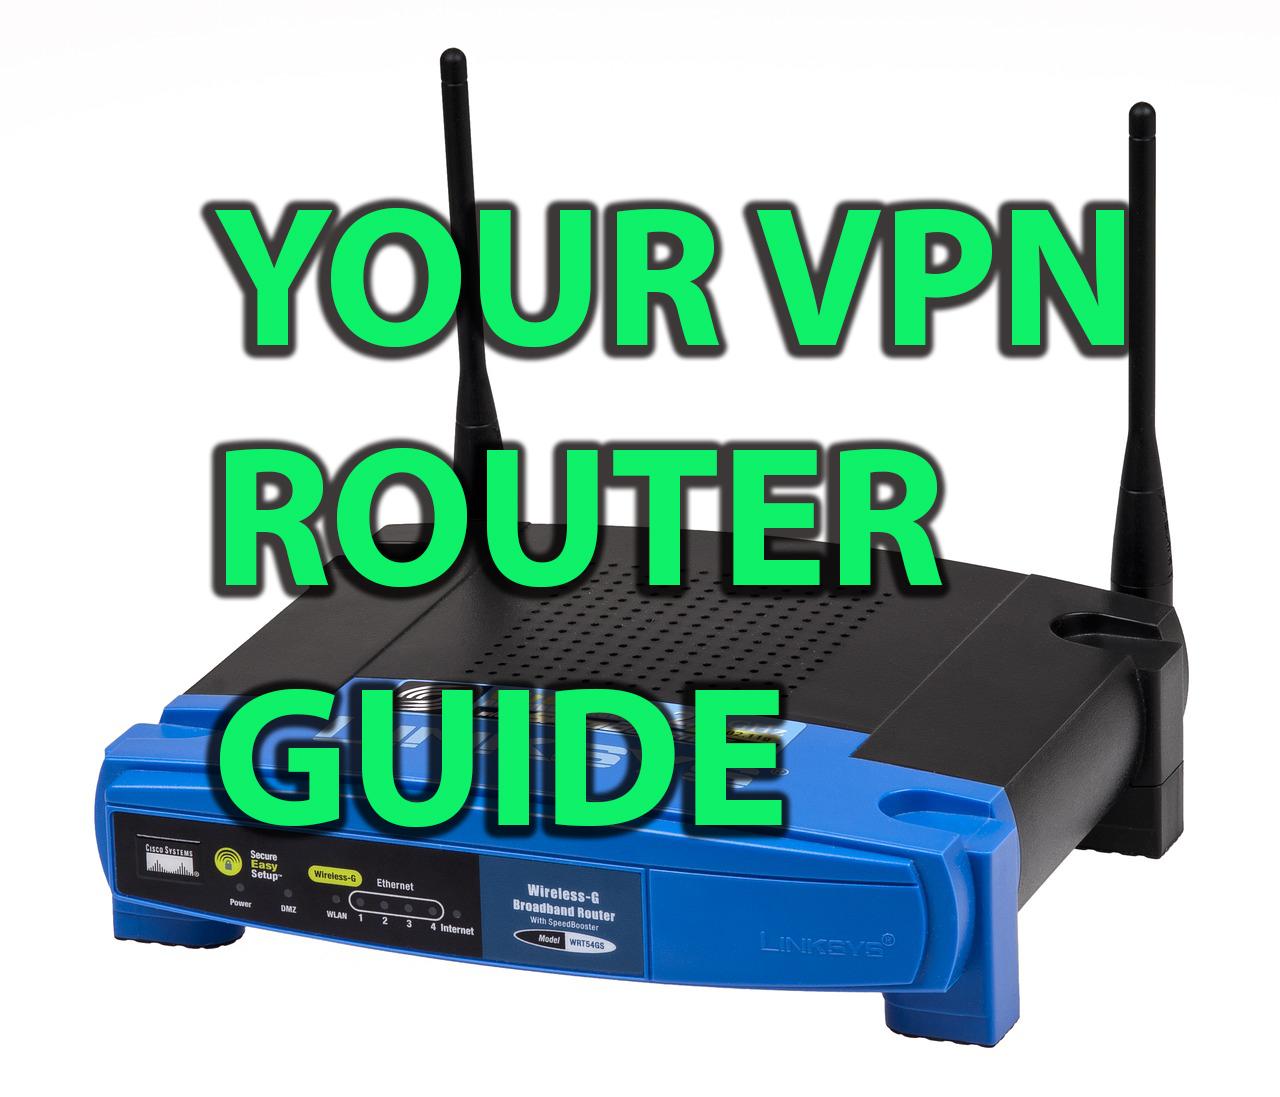 vpn router guide